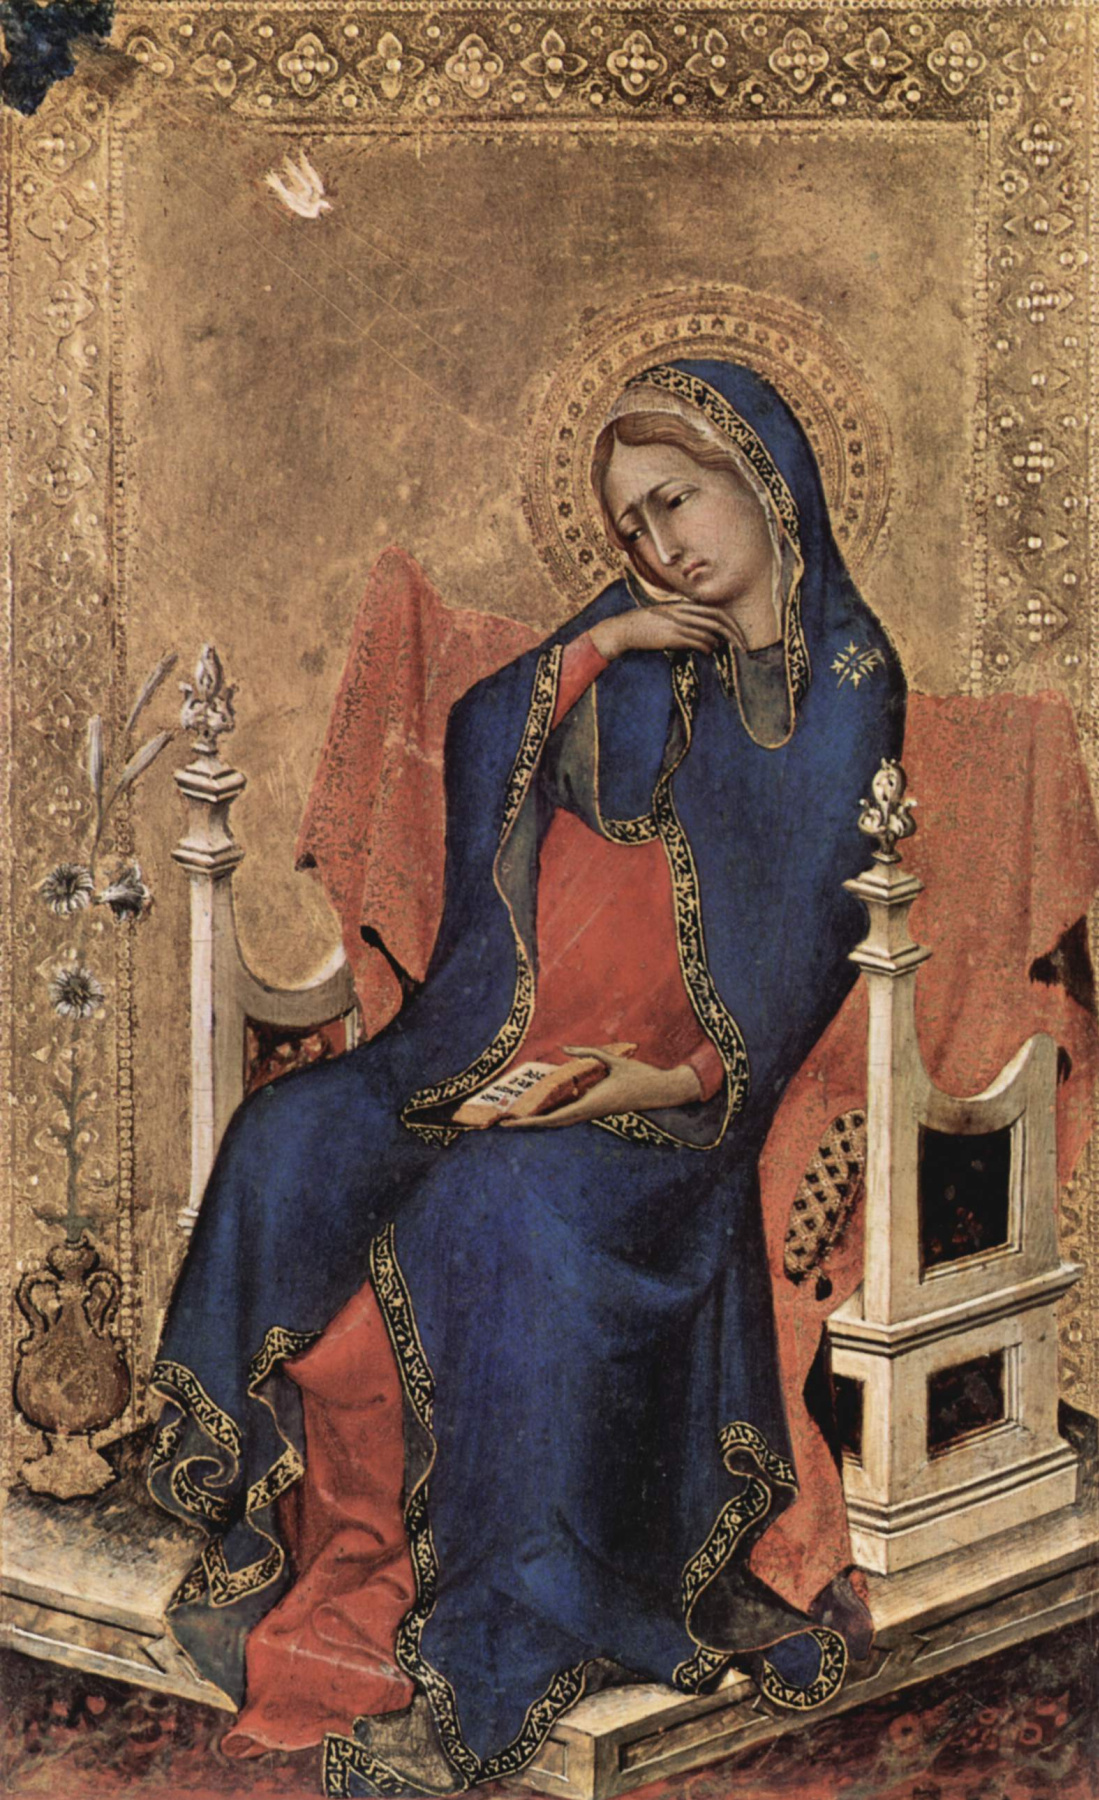 Simone Martini. The Altar Orsini. The Annunciation Of Mary